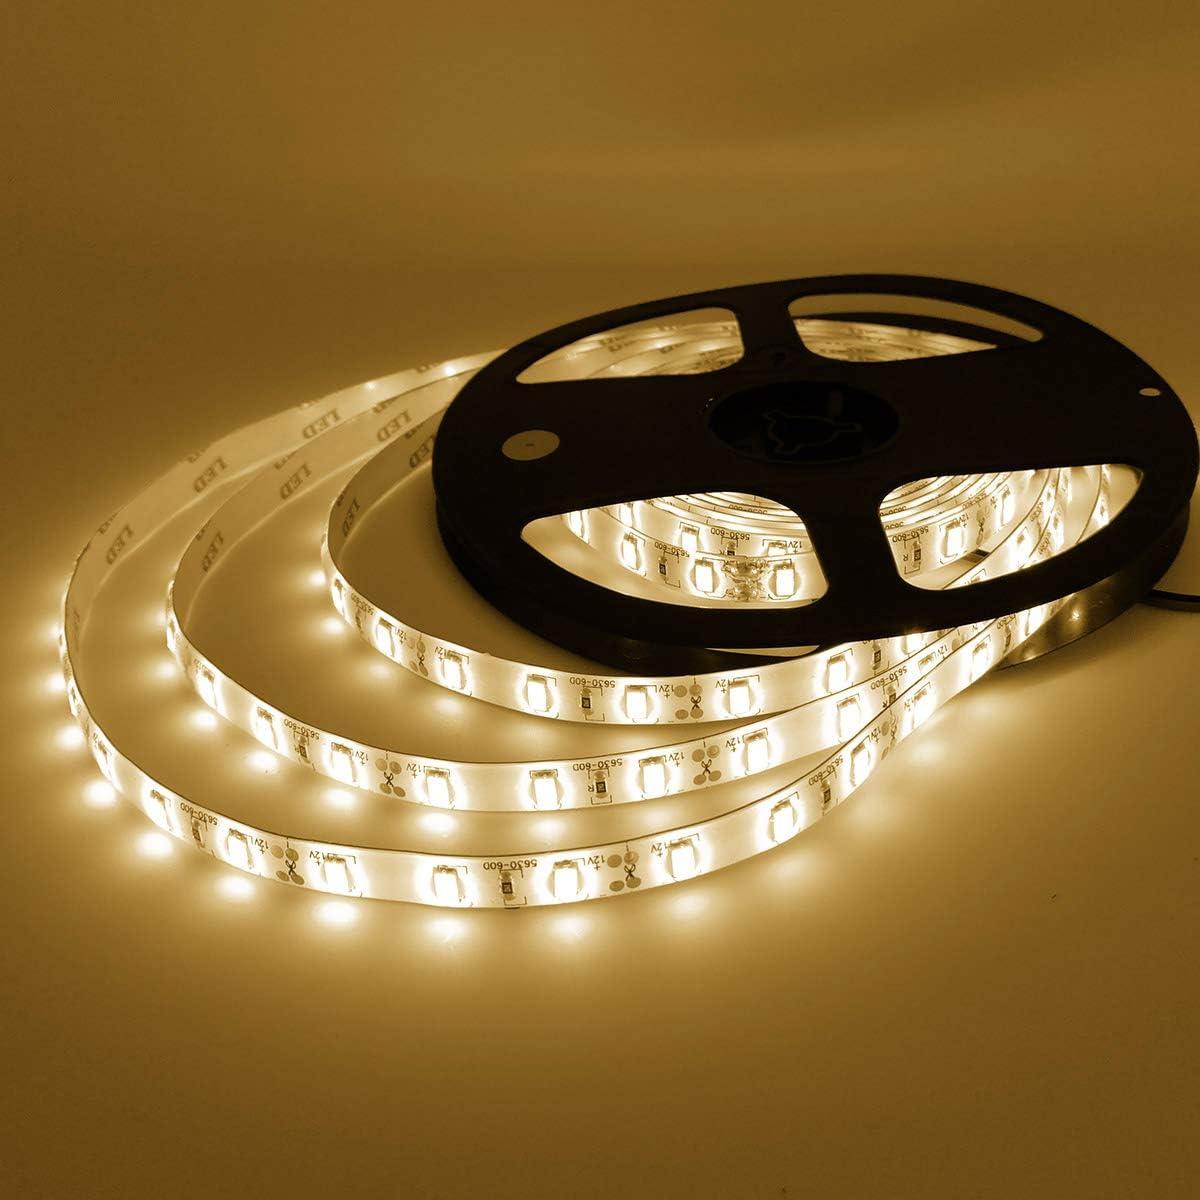 Details about  /16Ft 5M 3528RGB waterproof SMD 300LED Light Strip Flexible Ribbon Tape e 267